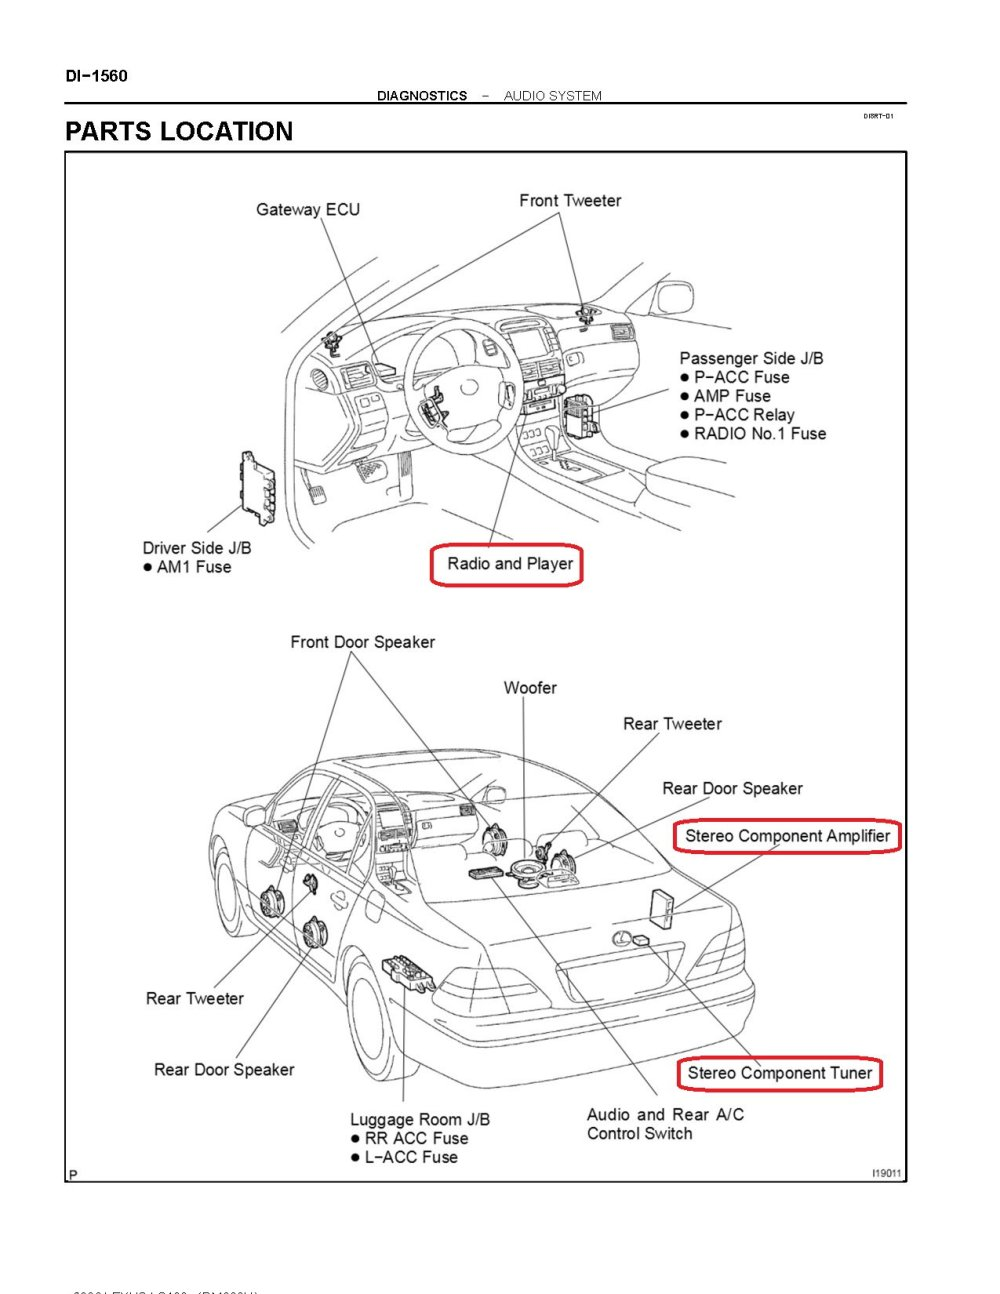 medium resolution of 2002 lexus ls 430 wiring harness diagram wiring library2002 lexus ls 430 wiring harness diagram